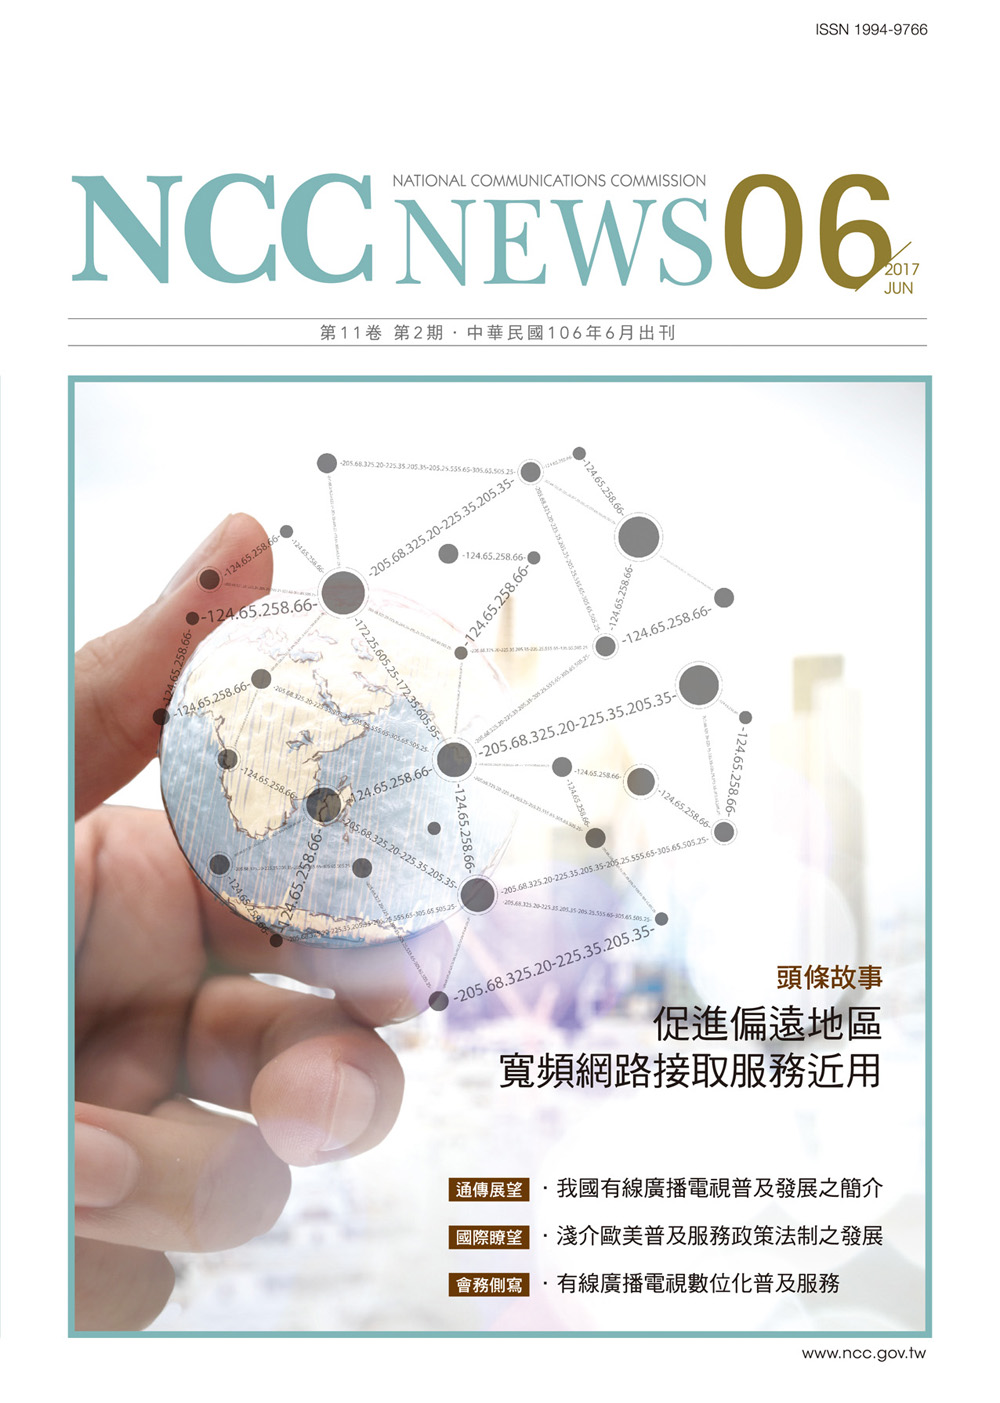 NCC NEWS 月刊106年6月號